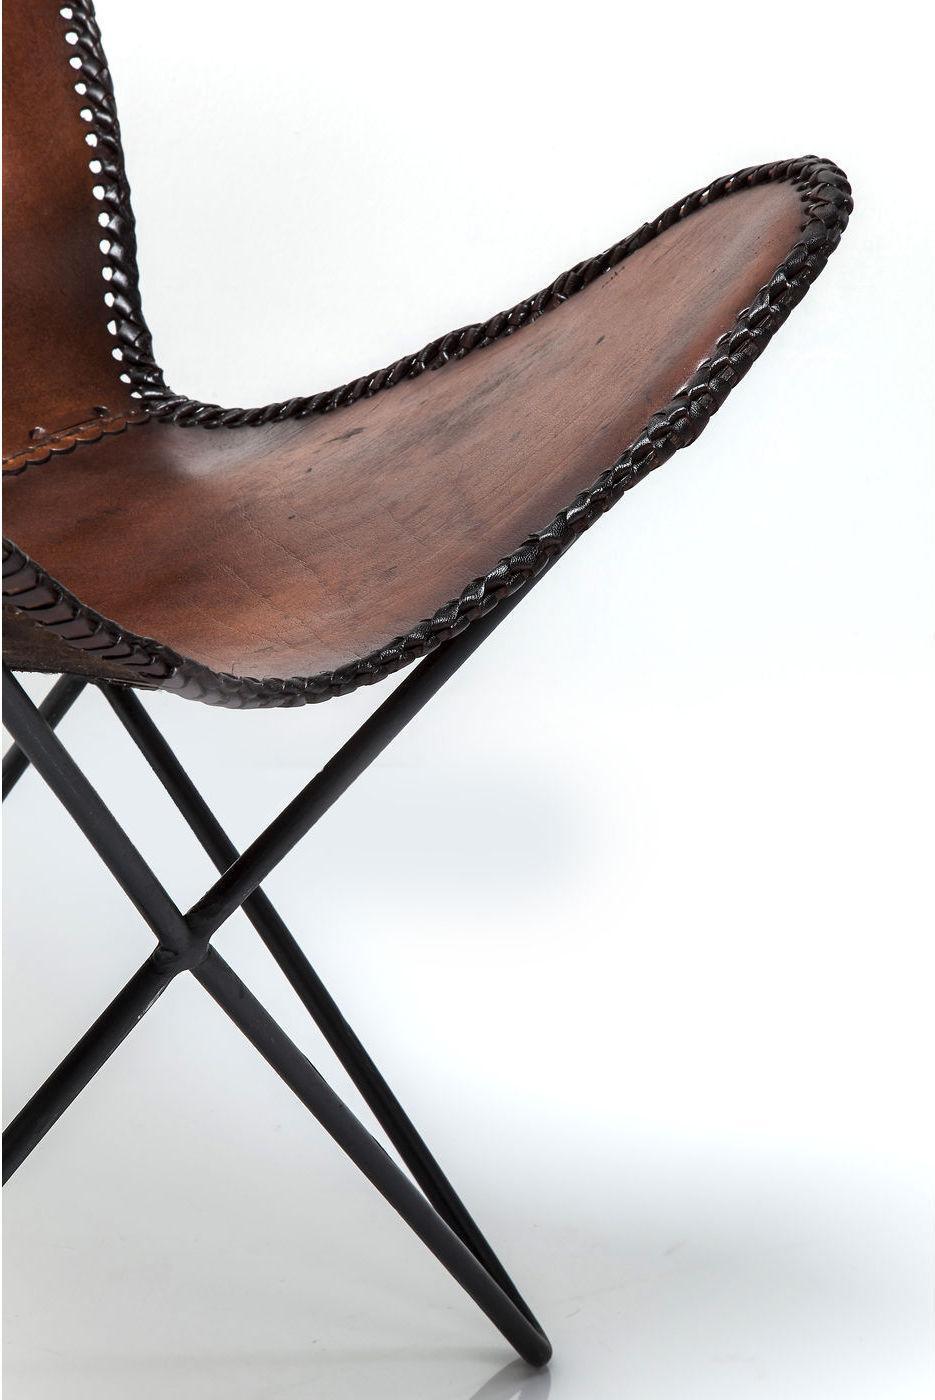 sessel butterfly brown eco kare design kaufen wohn und lifestylewebshop. Black Bedroom Furniture Sets. Home Design Ideas